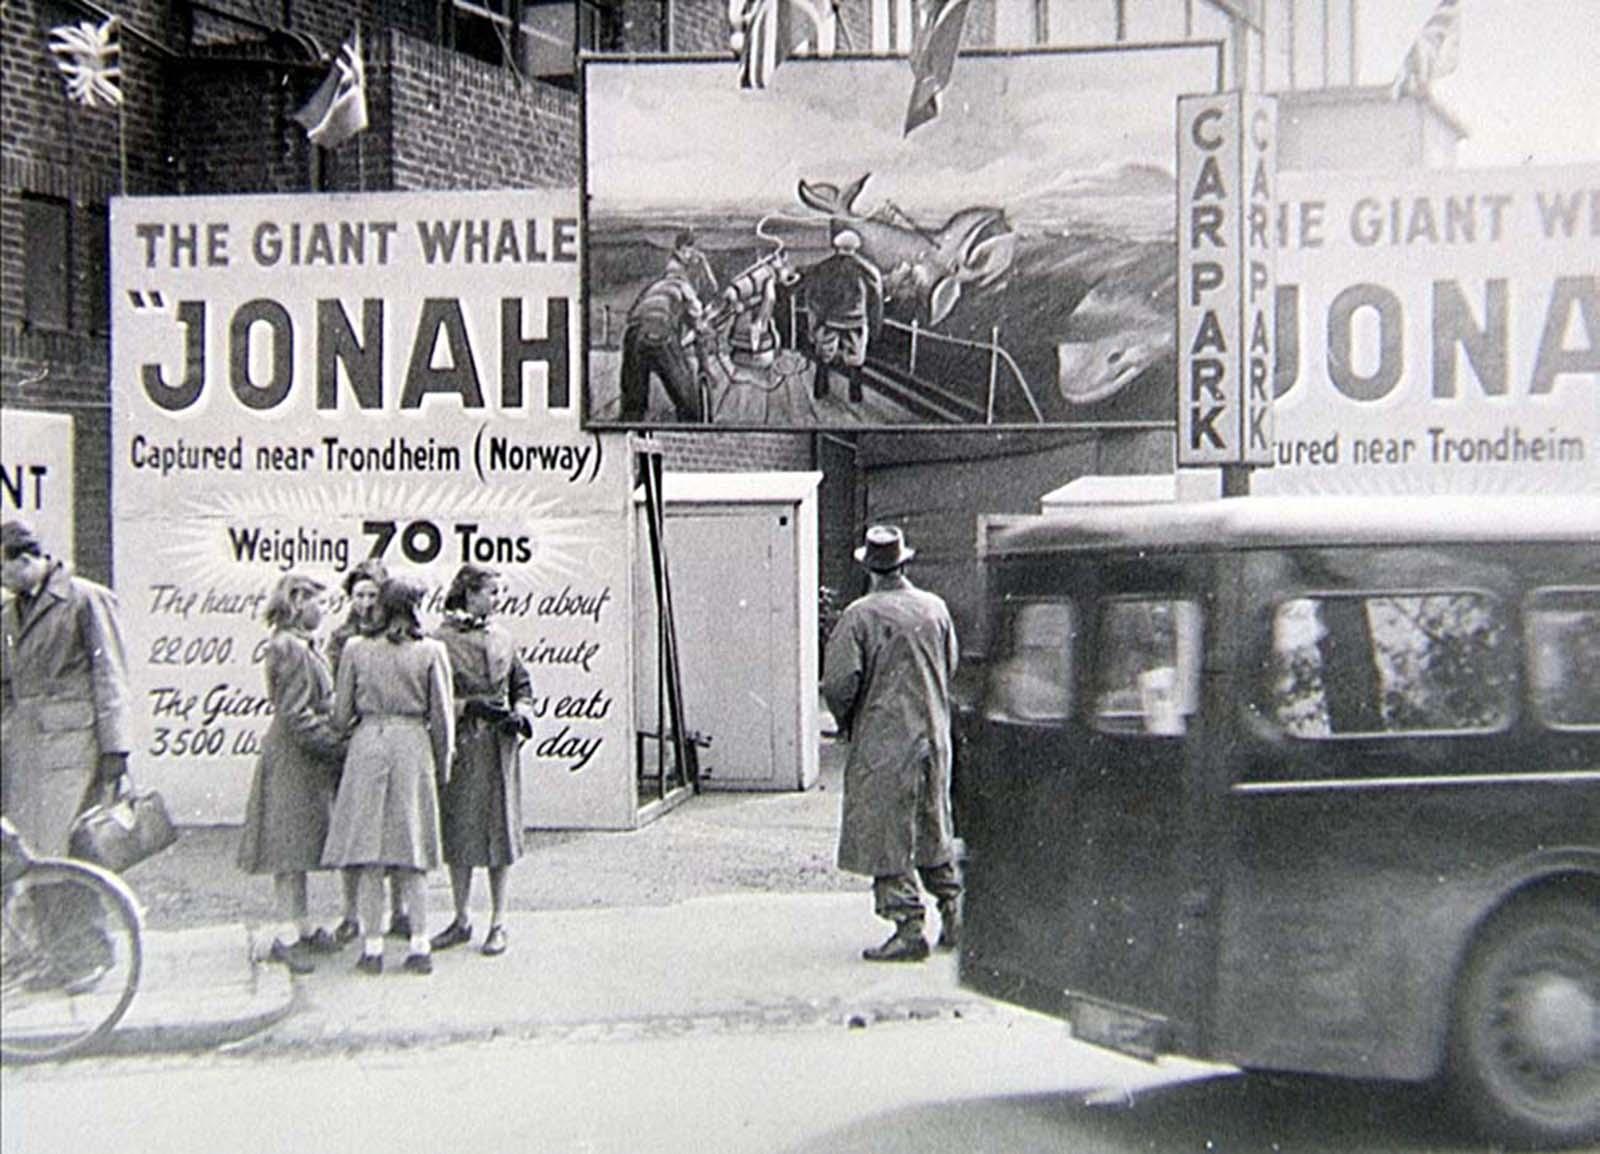 Las ballenas muertas en descomposición que recorrieron Europa, 1950-1970